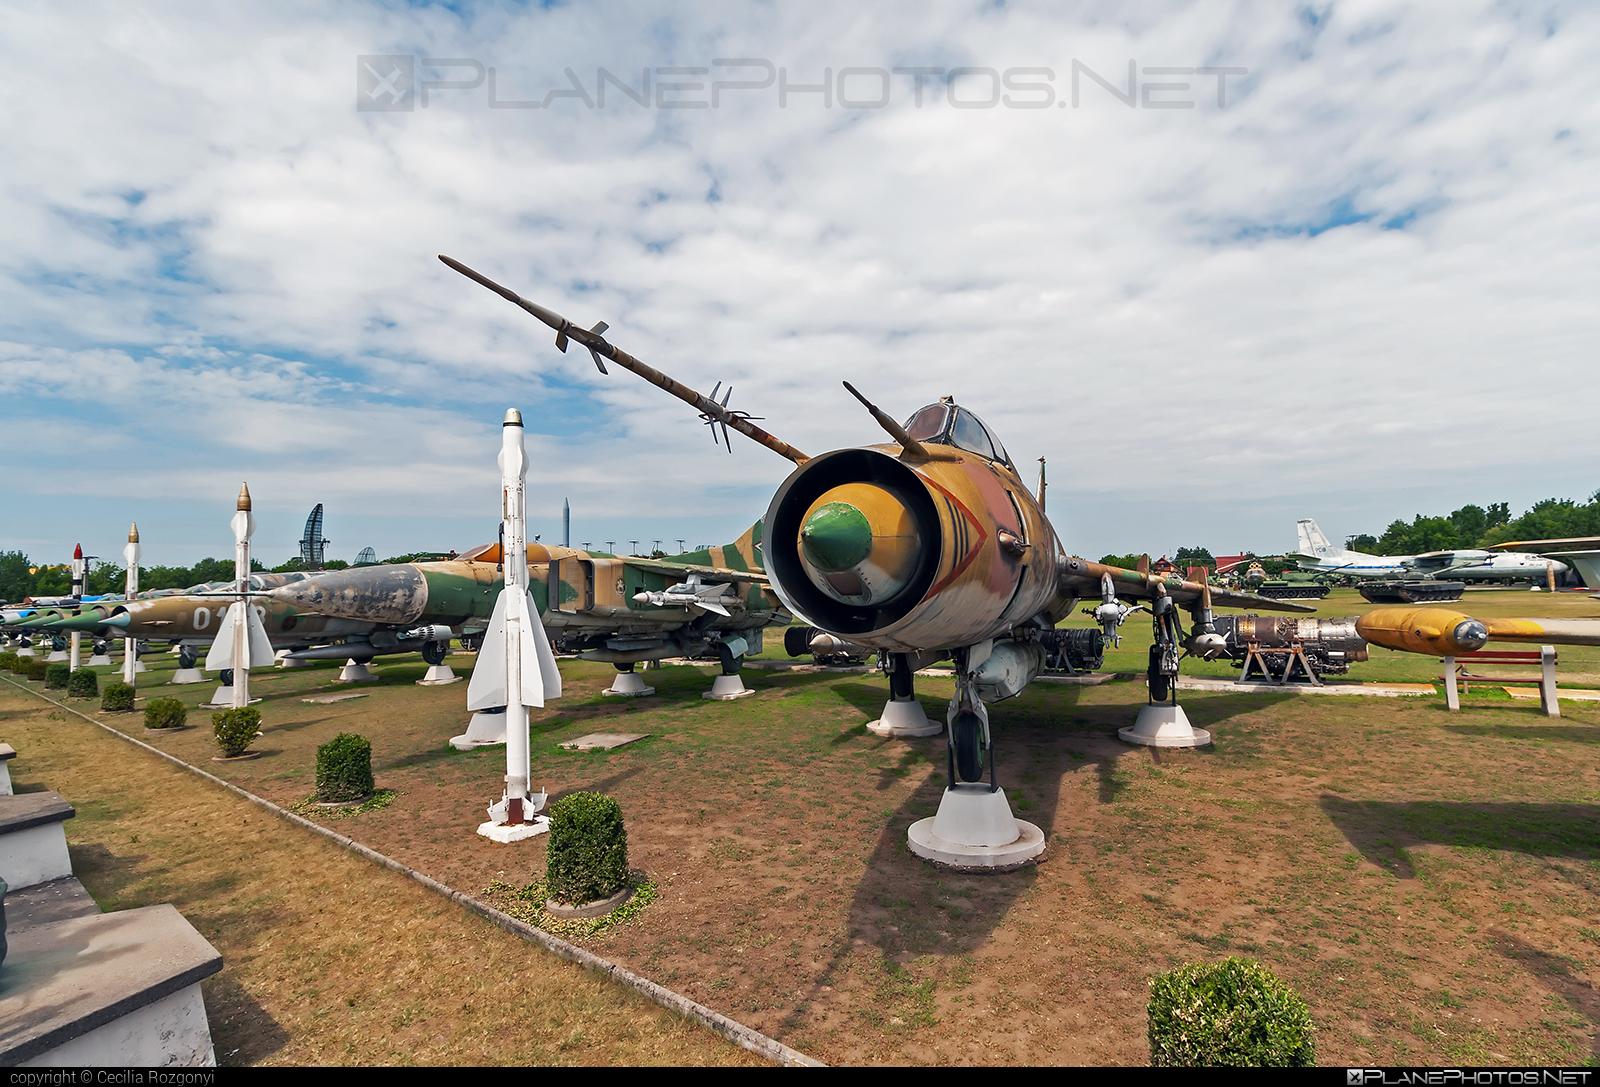 Sukhoi Su-22M3 - 11 operated by Magyar Légierő (Hungarian Air Force) #hungarianairforce #magyarlegiero #sukhoi